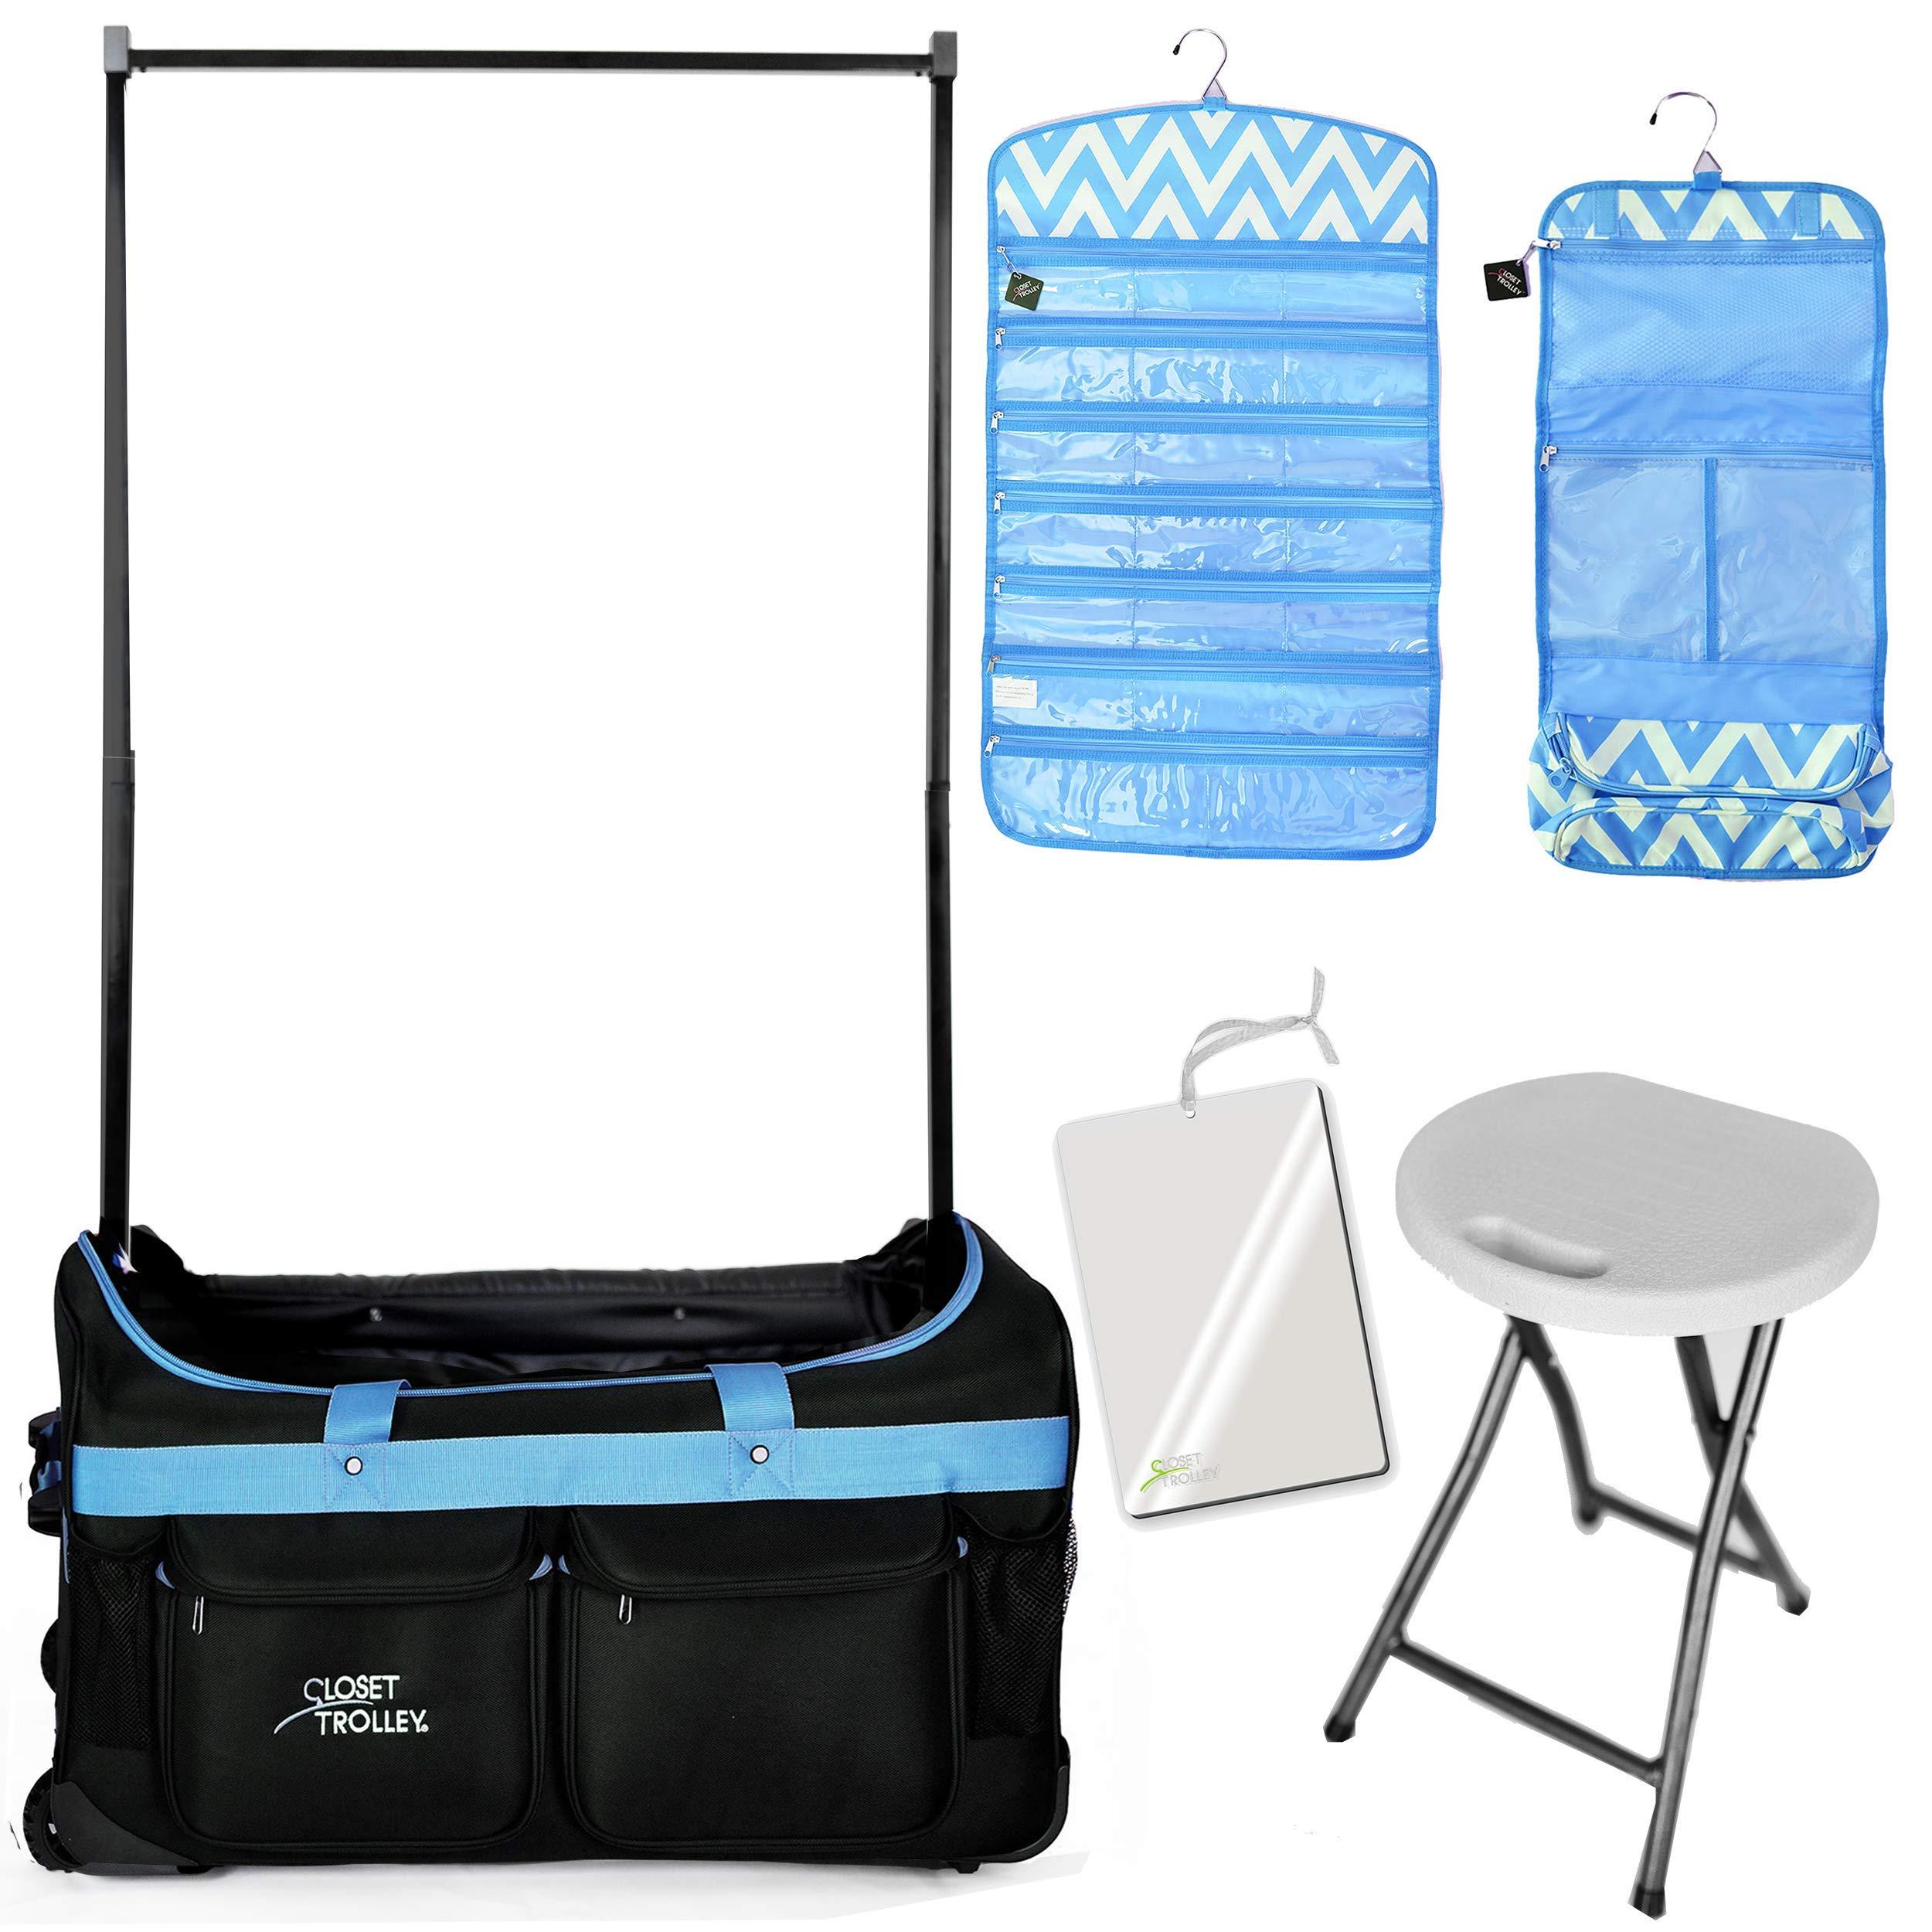 BUNDLE PACK (BLUE BAG w/BLUE ACCESSORIES) by Closet Trolley Dance Duffels